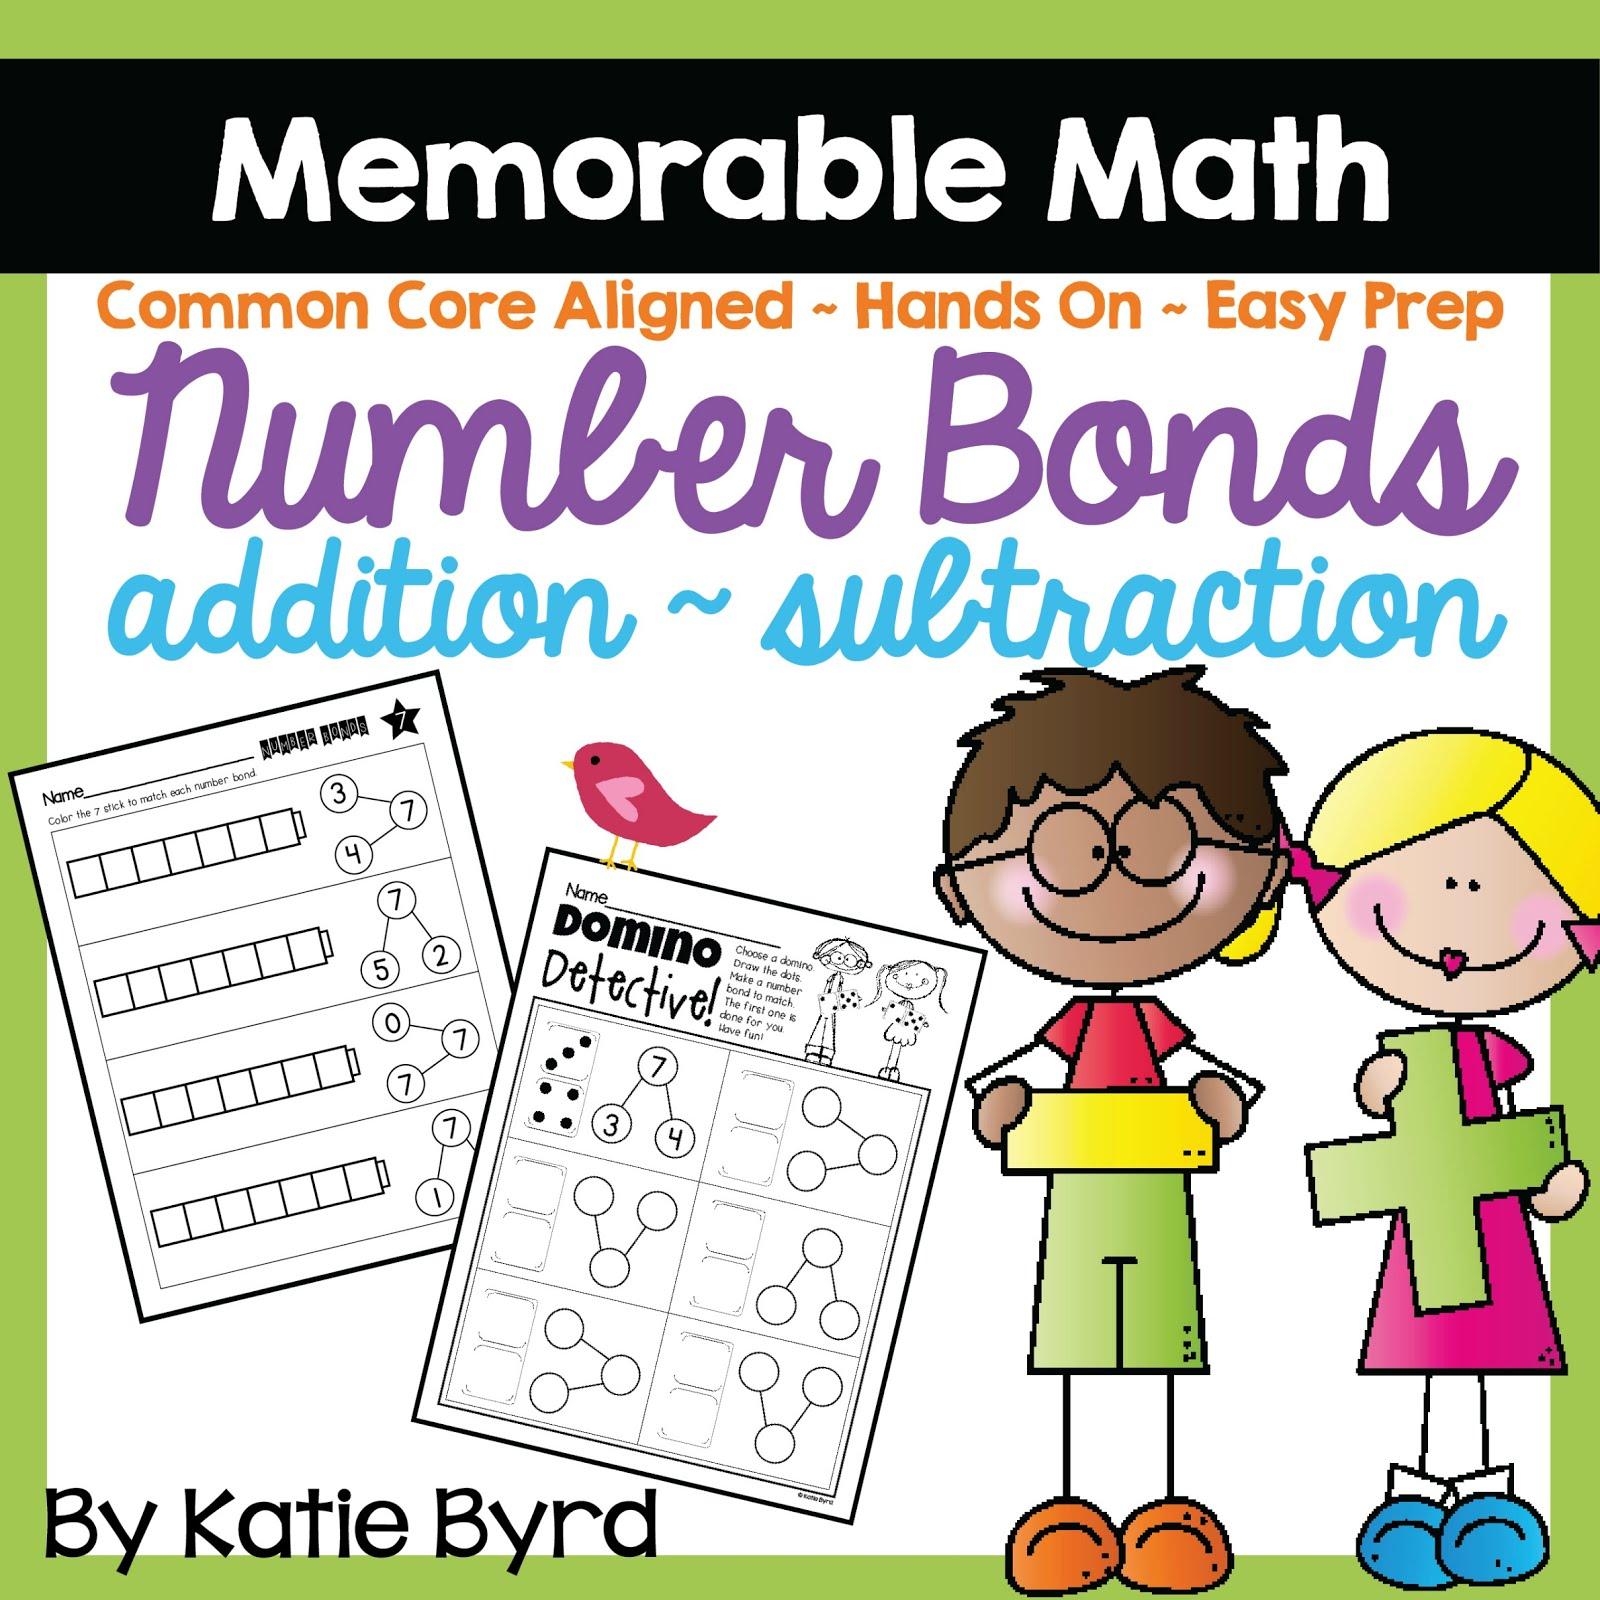 Teaching Number Bonds?